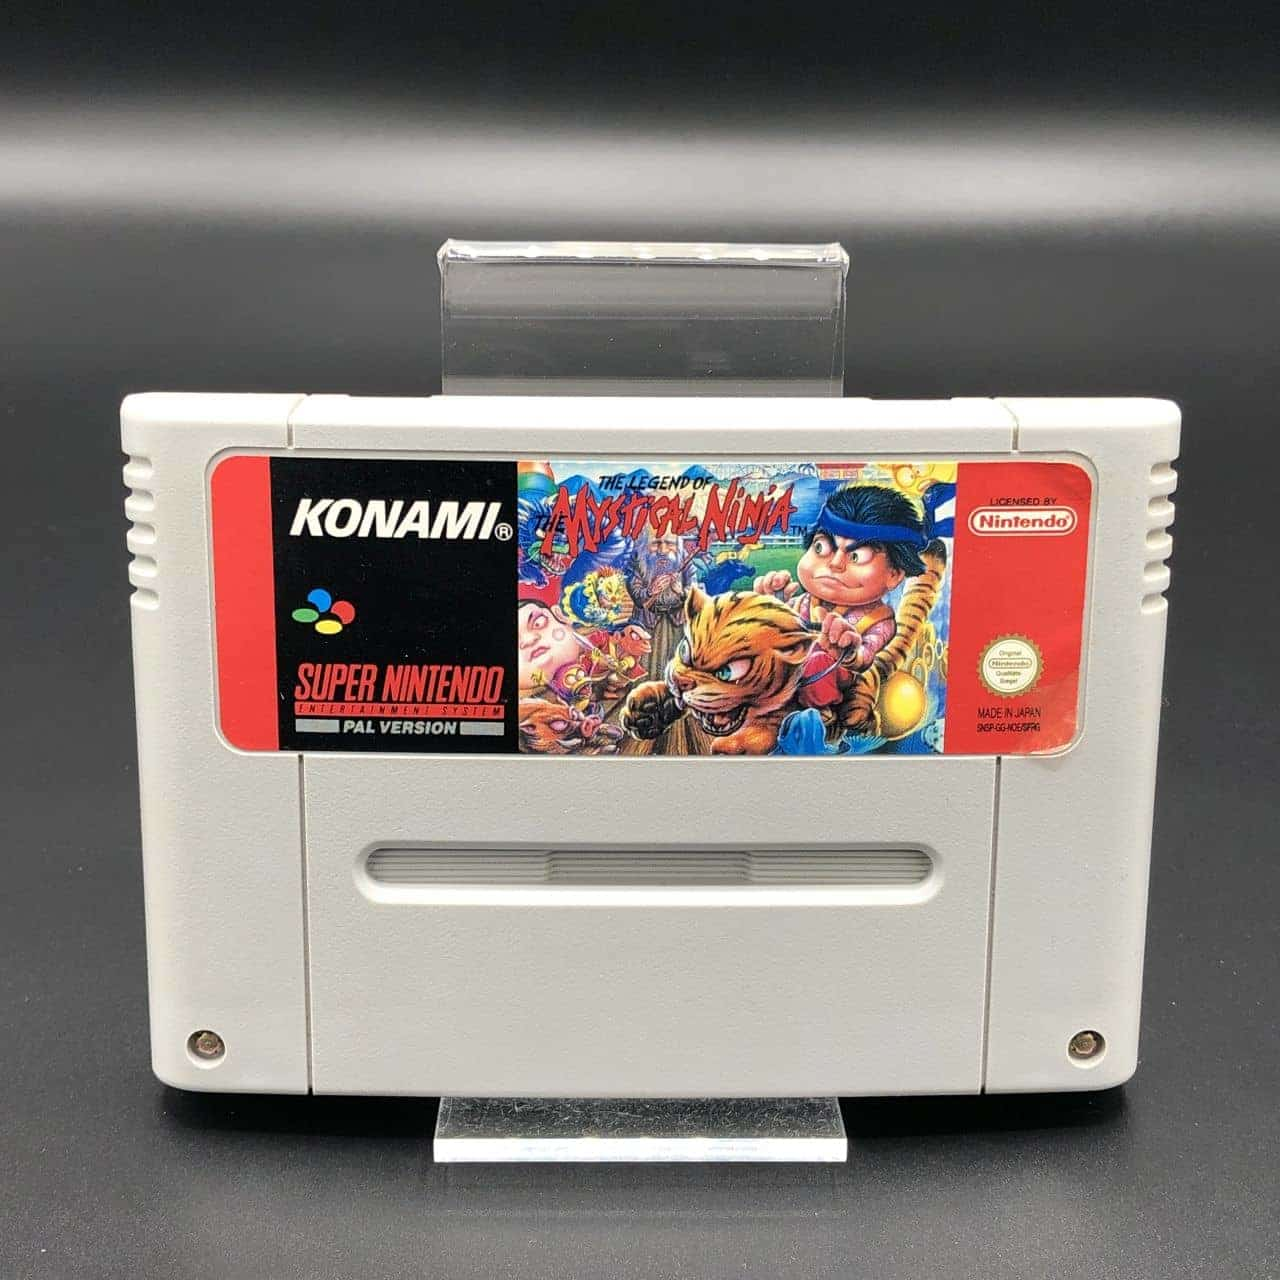 SNES The Legend of the Mystical Ninja (Modul) (Gut) Super Nintendo